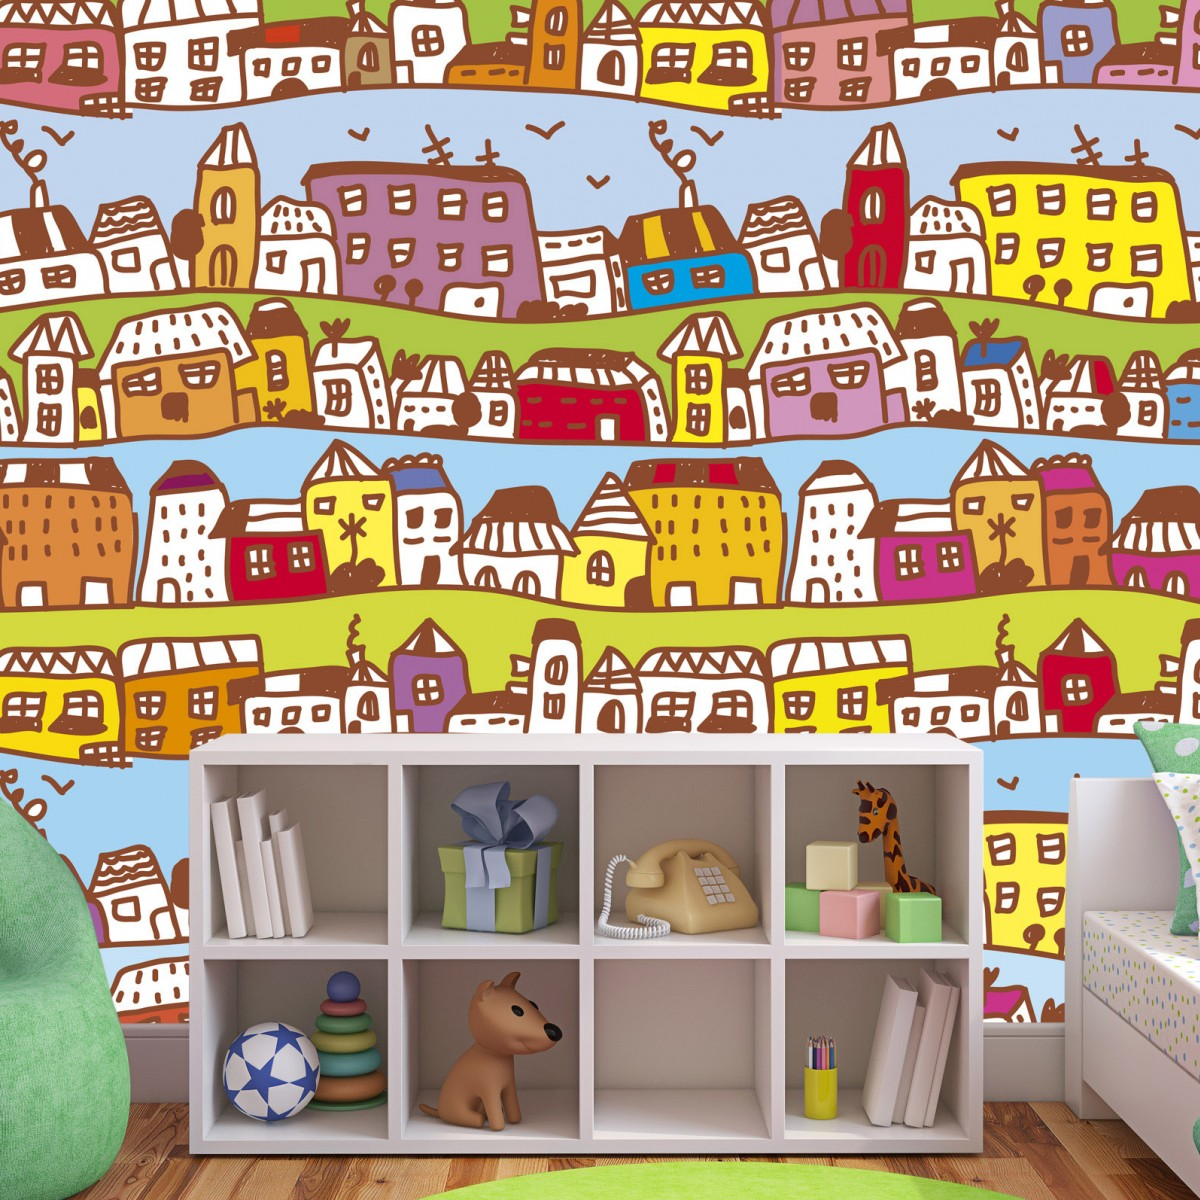 Foto tapet 3D Houses In Town, Dimex, 5 fâșii, 375 x 250cm